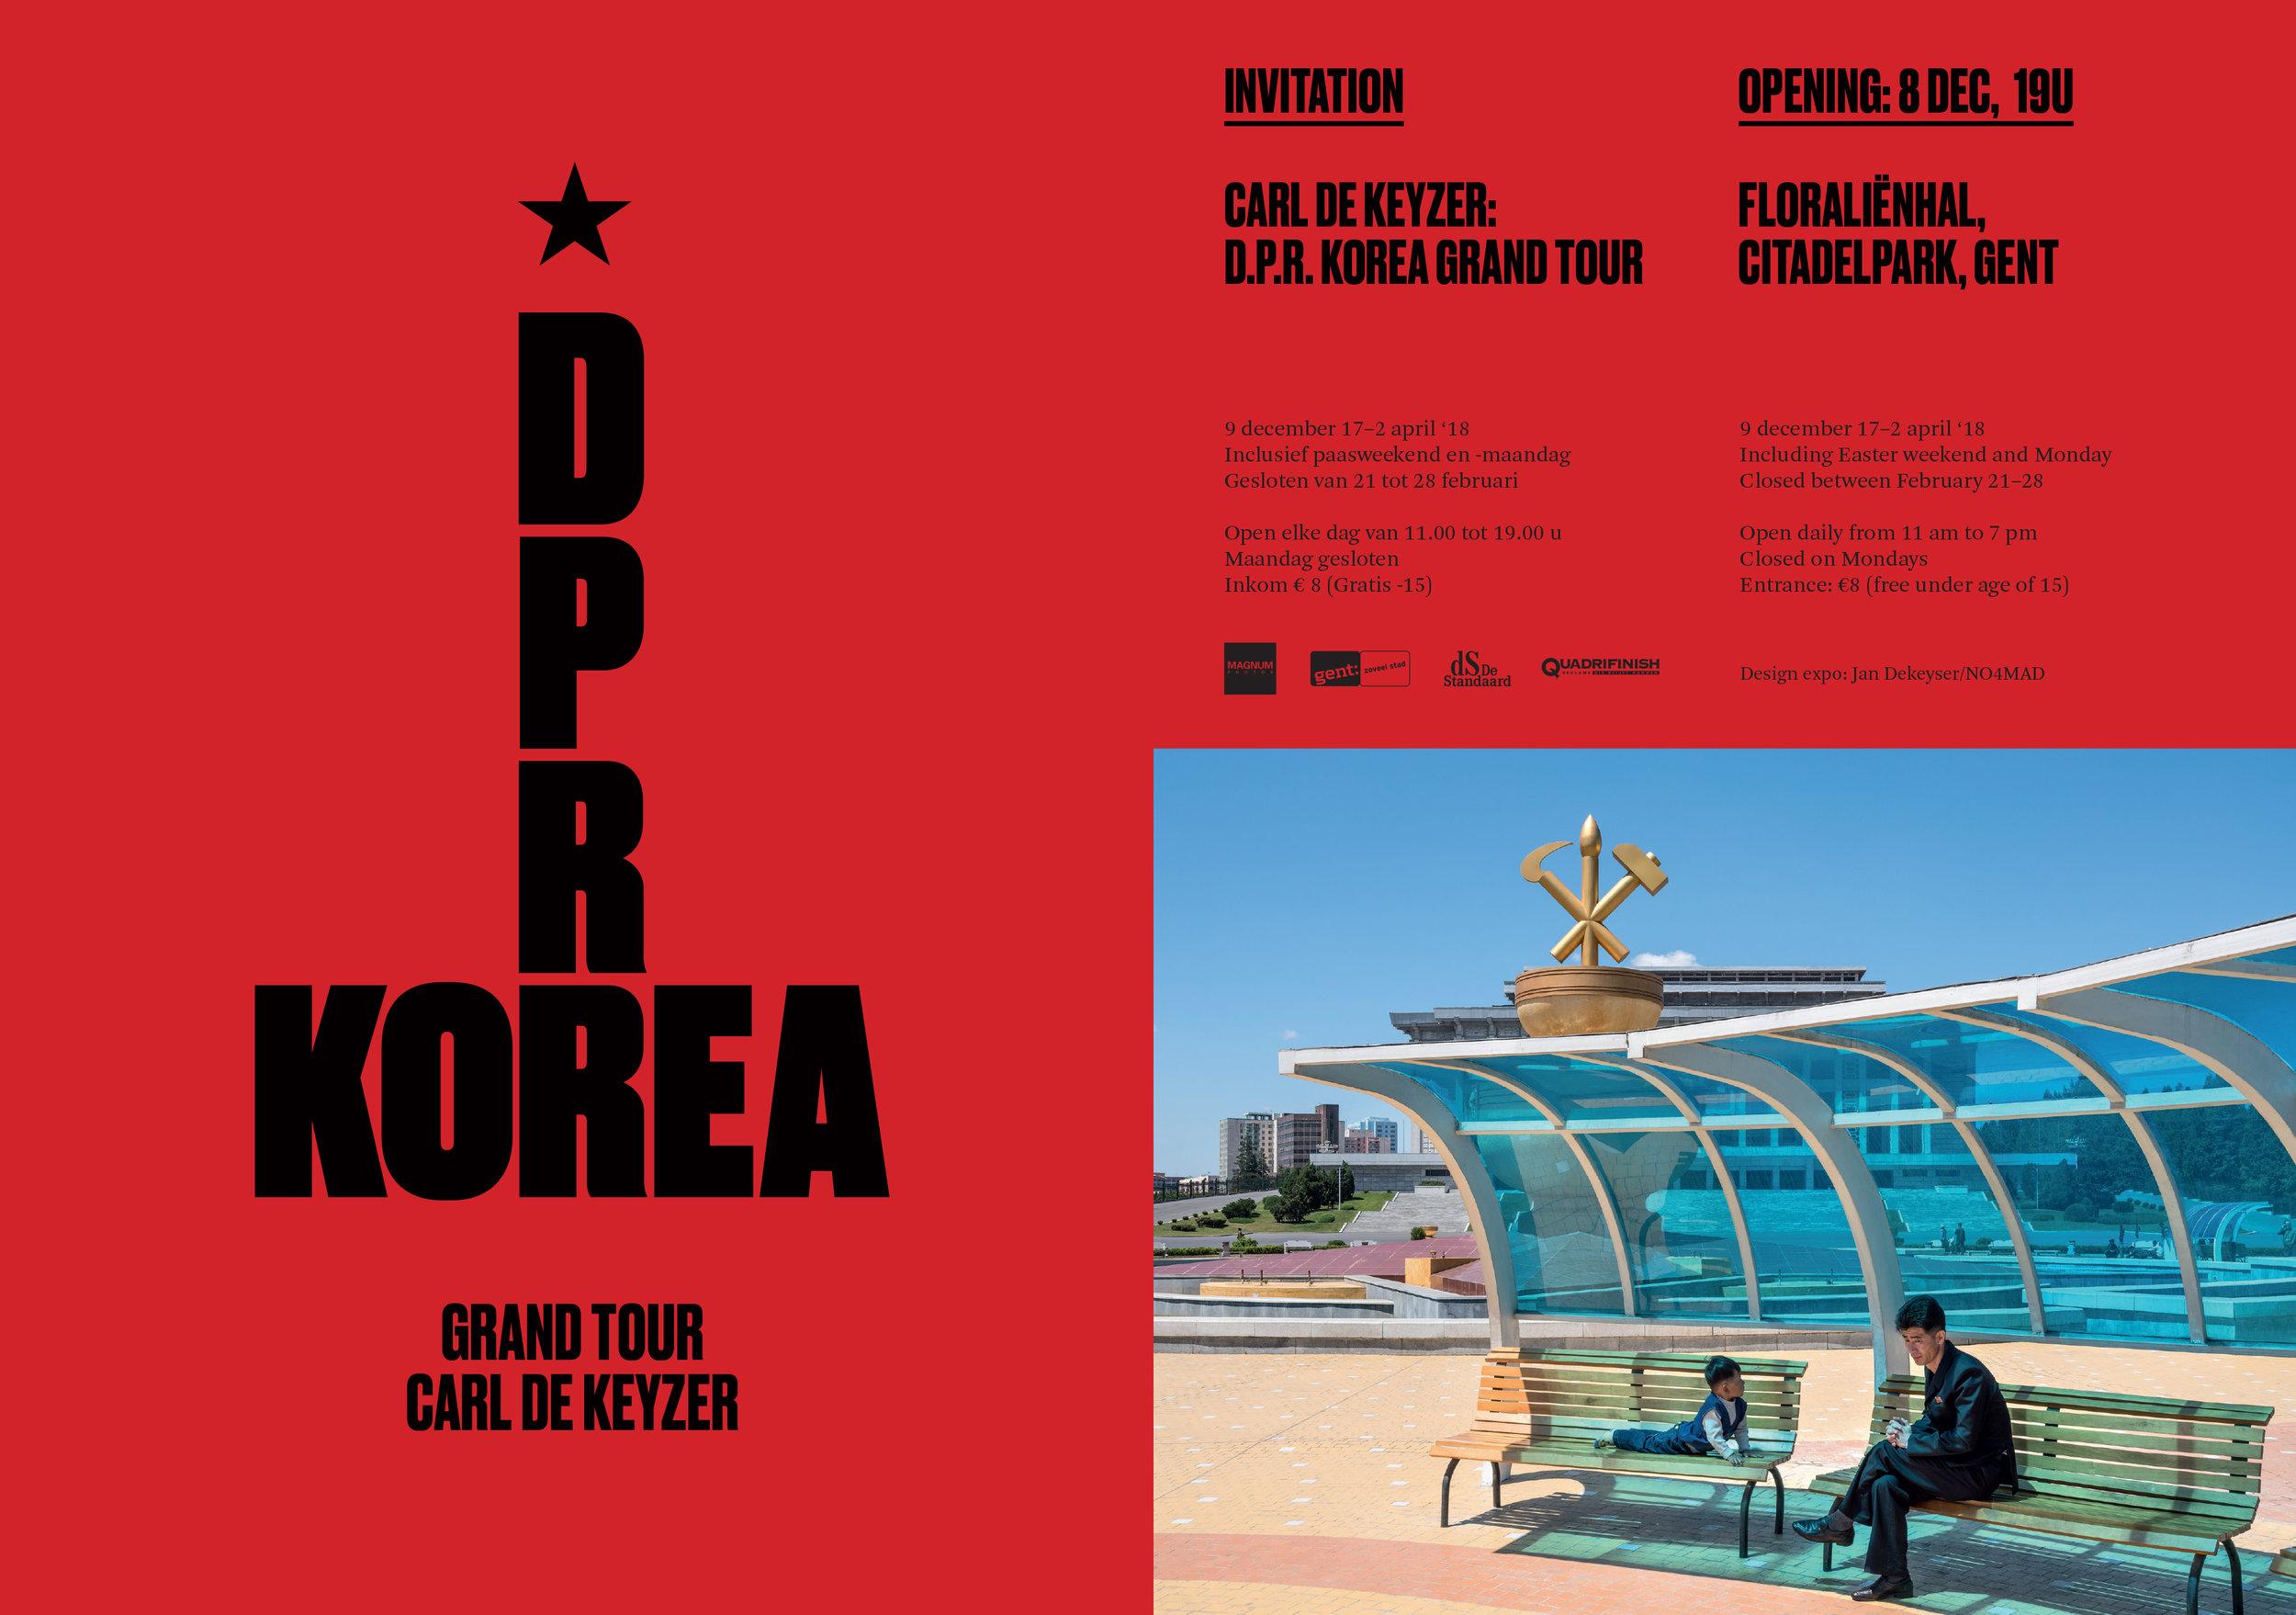 DPRK_UITNODIGINGemail.jpg